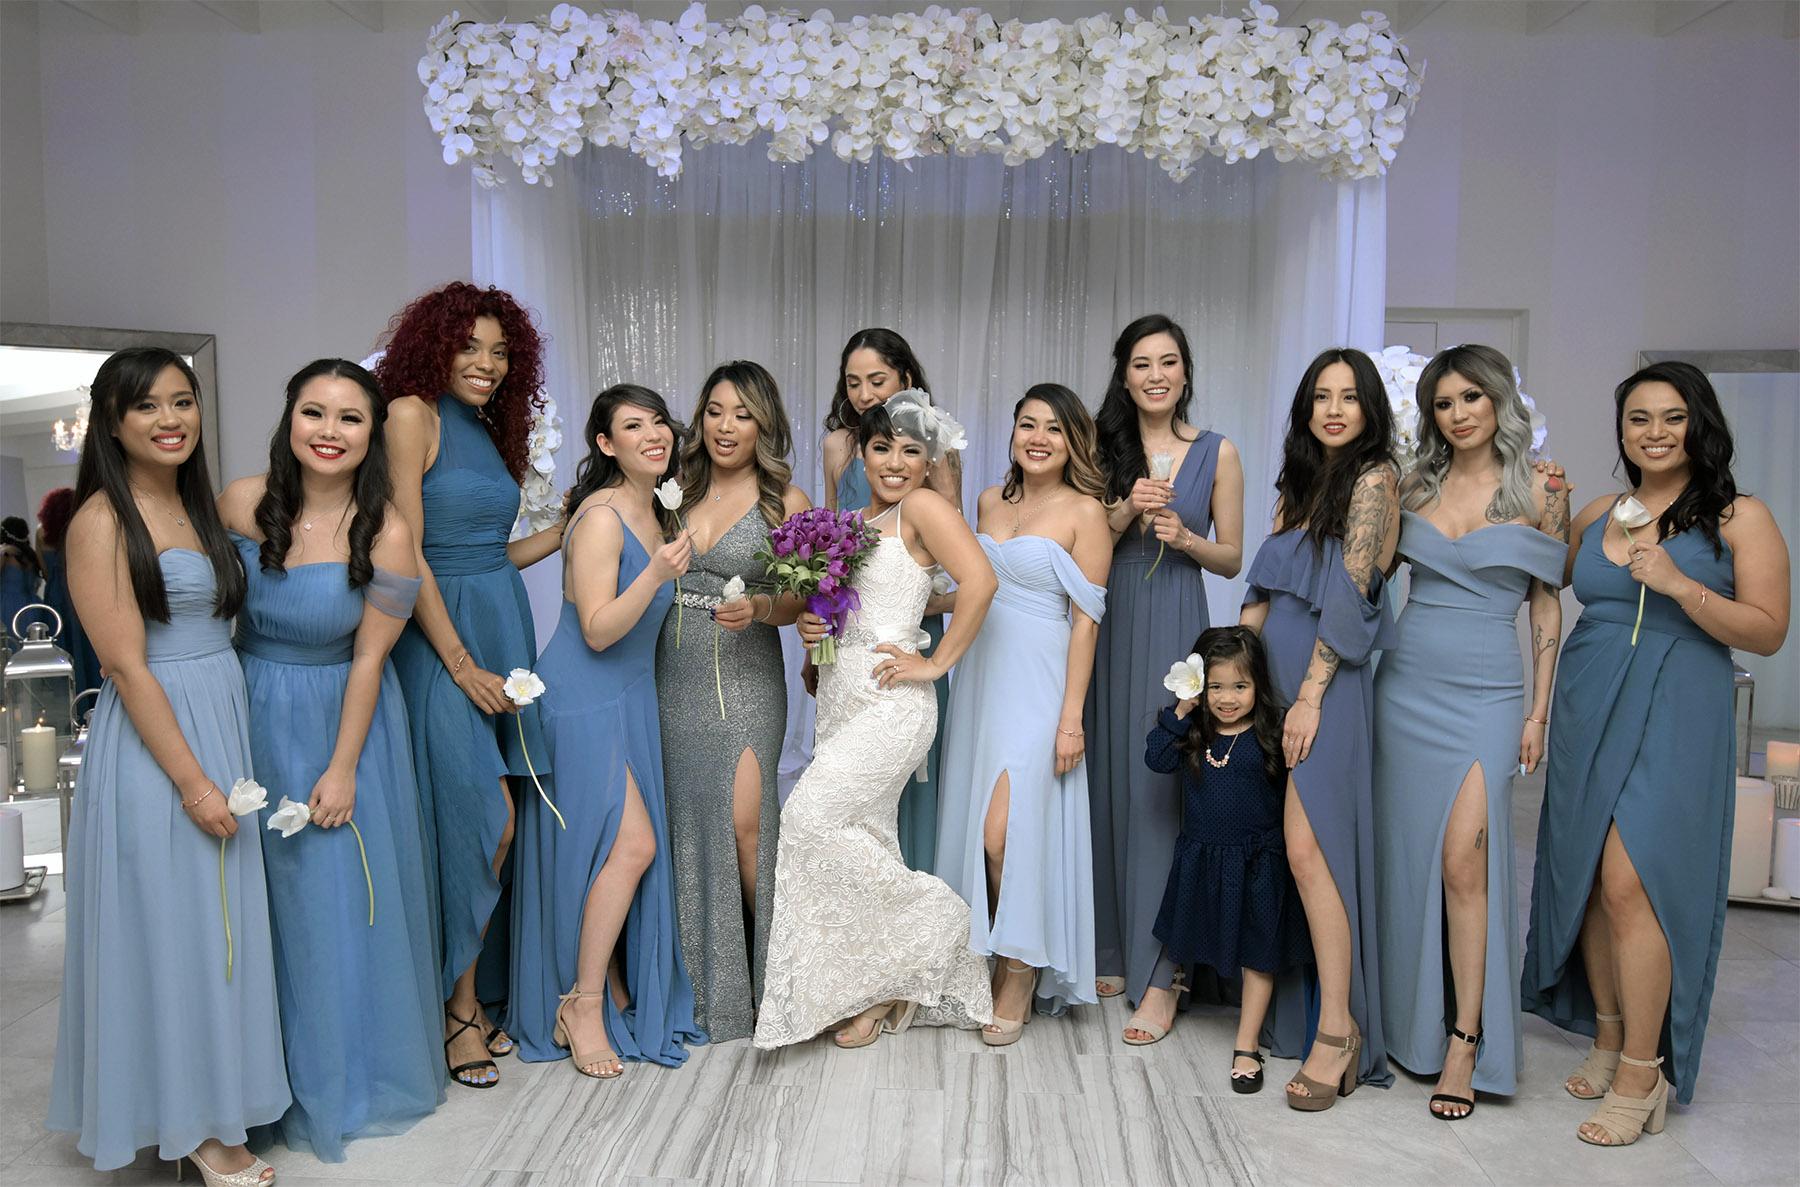 albertson wedding chapel photos